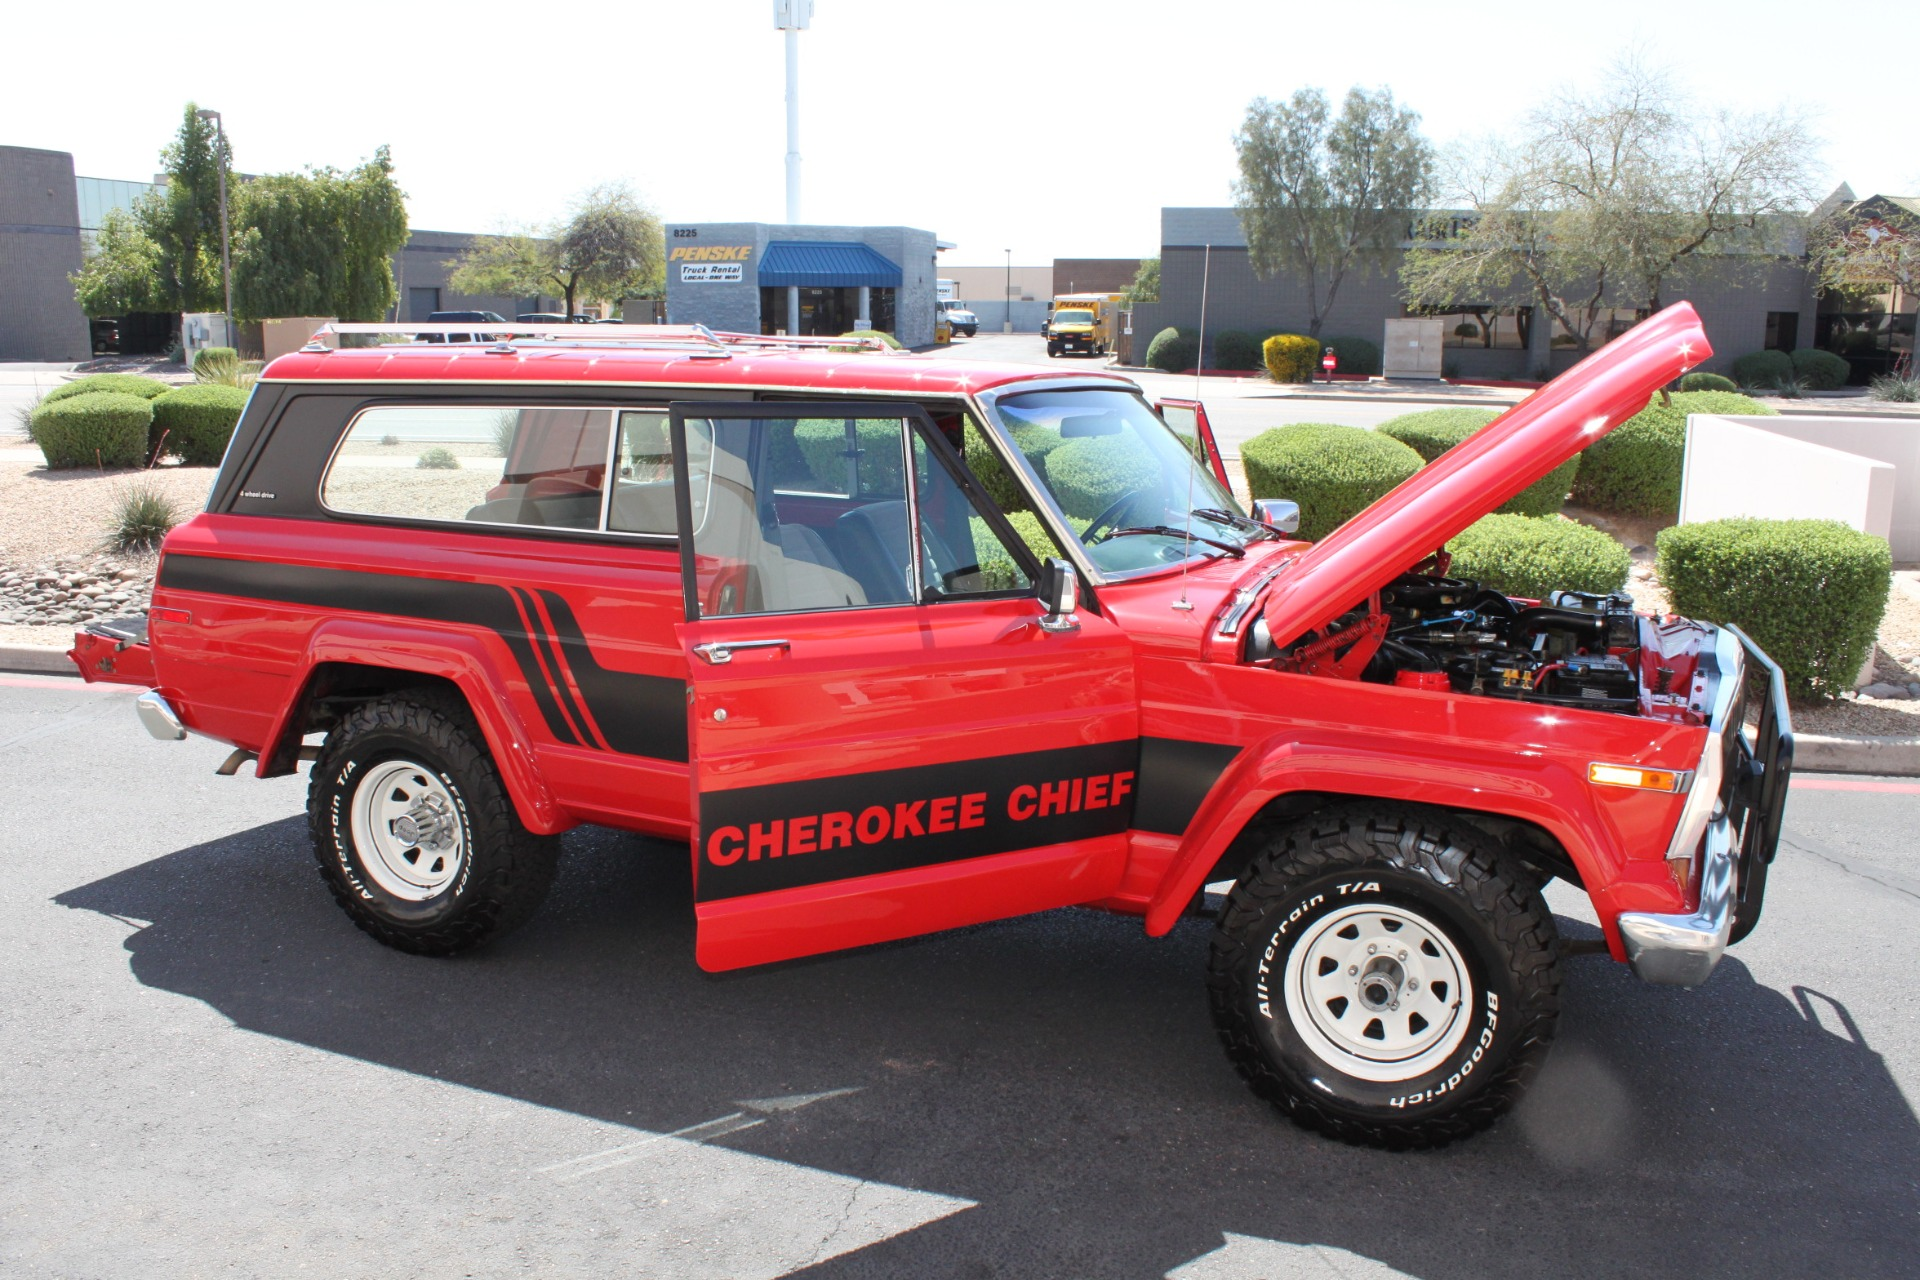 Used-1983-Jeep-Cherokee-Chief-4WD-XJ